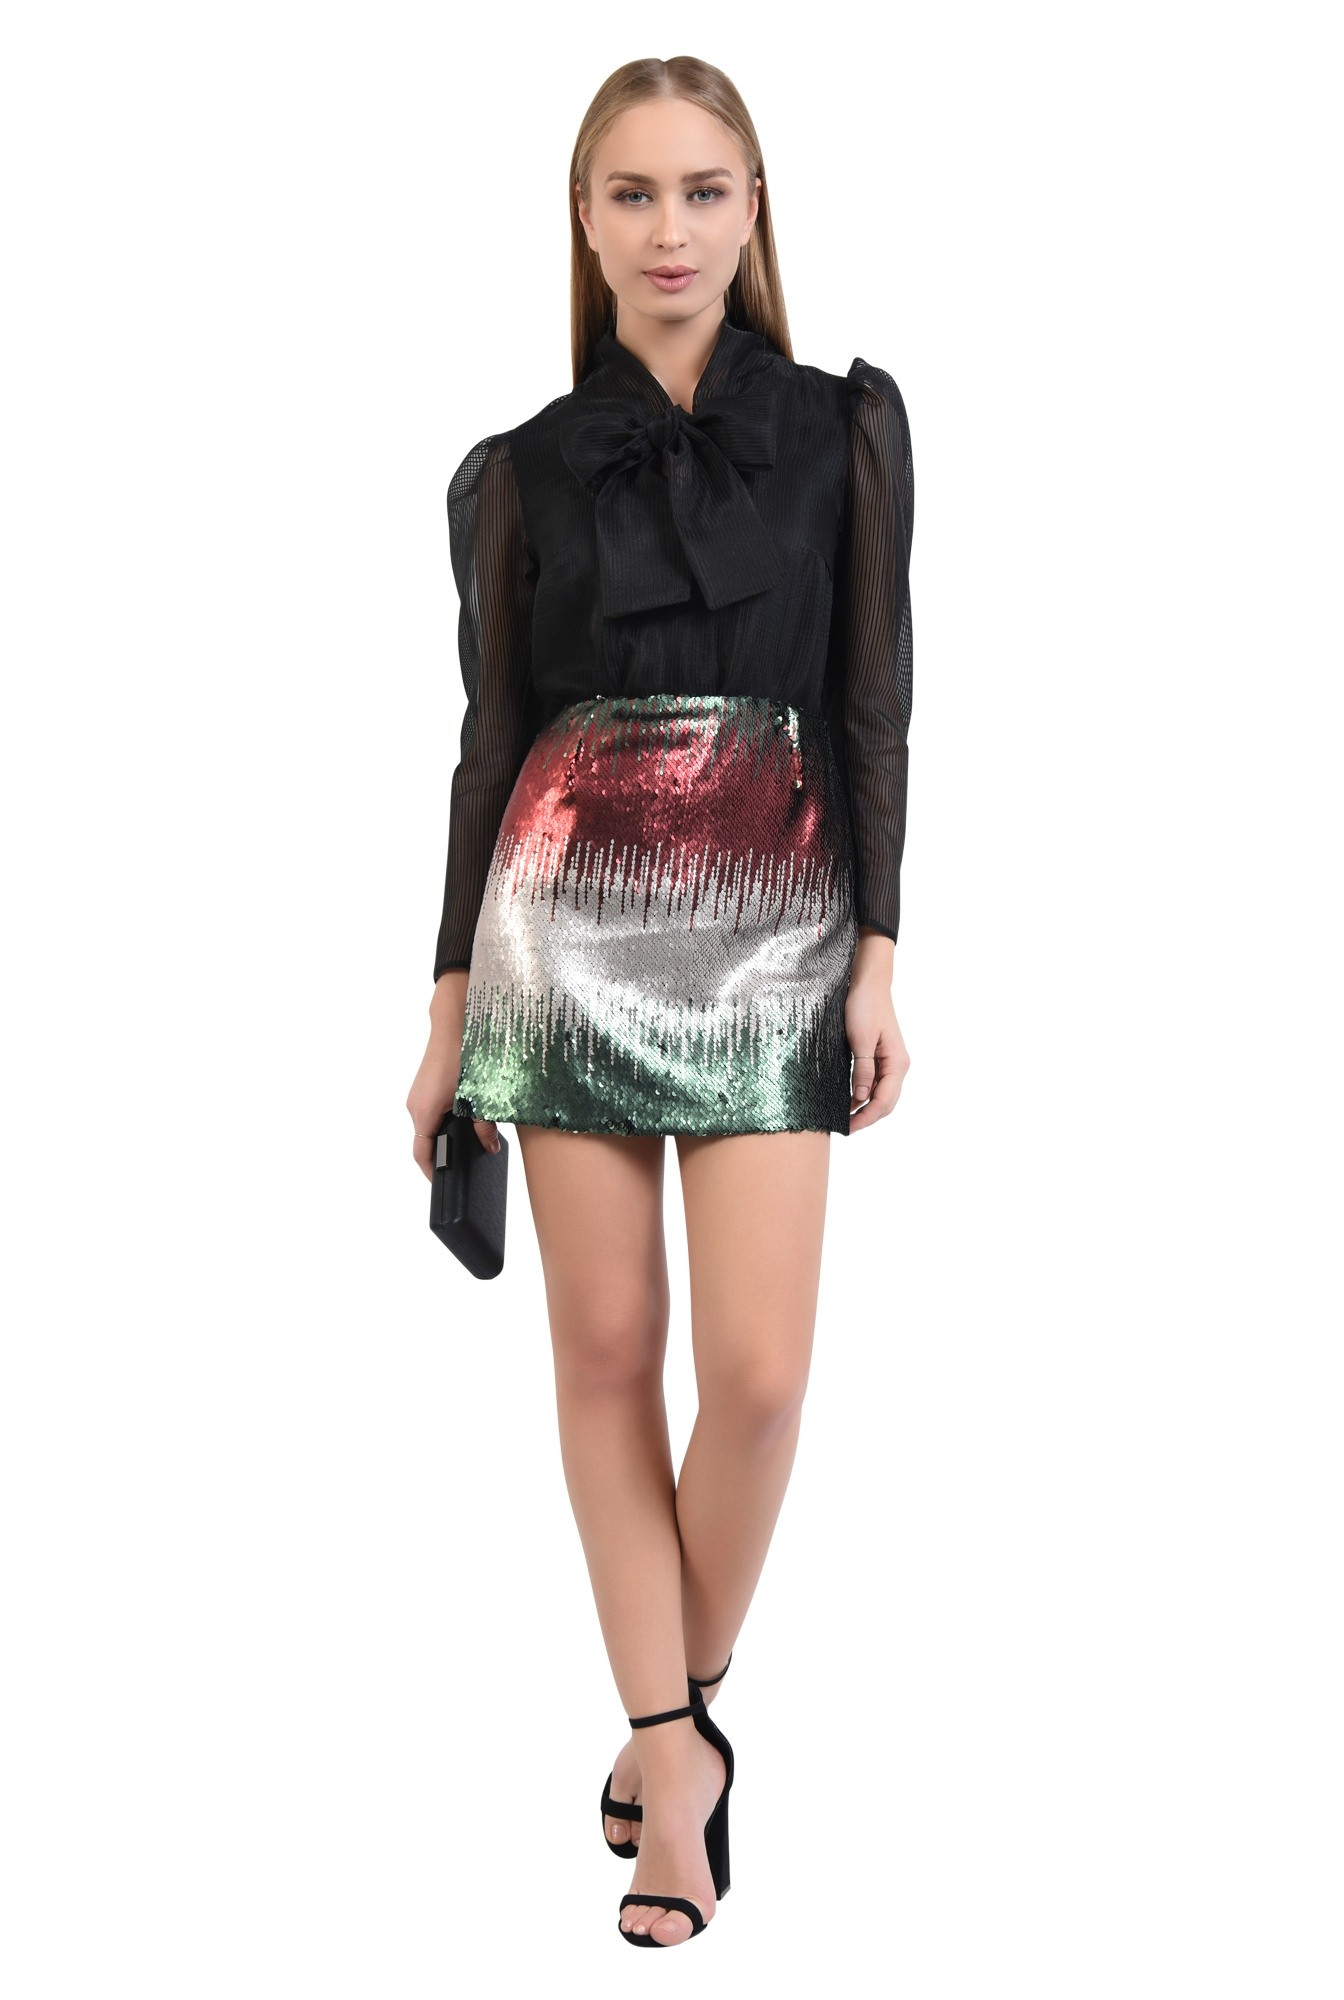 3 - 360 - fusta multicolora, paiete aplicate, croi drept, mini